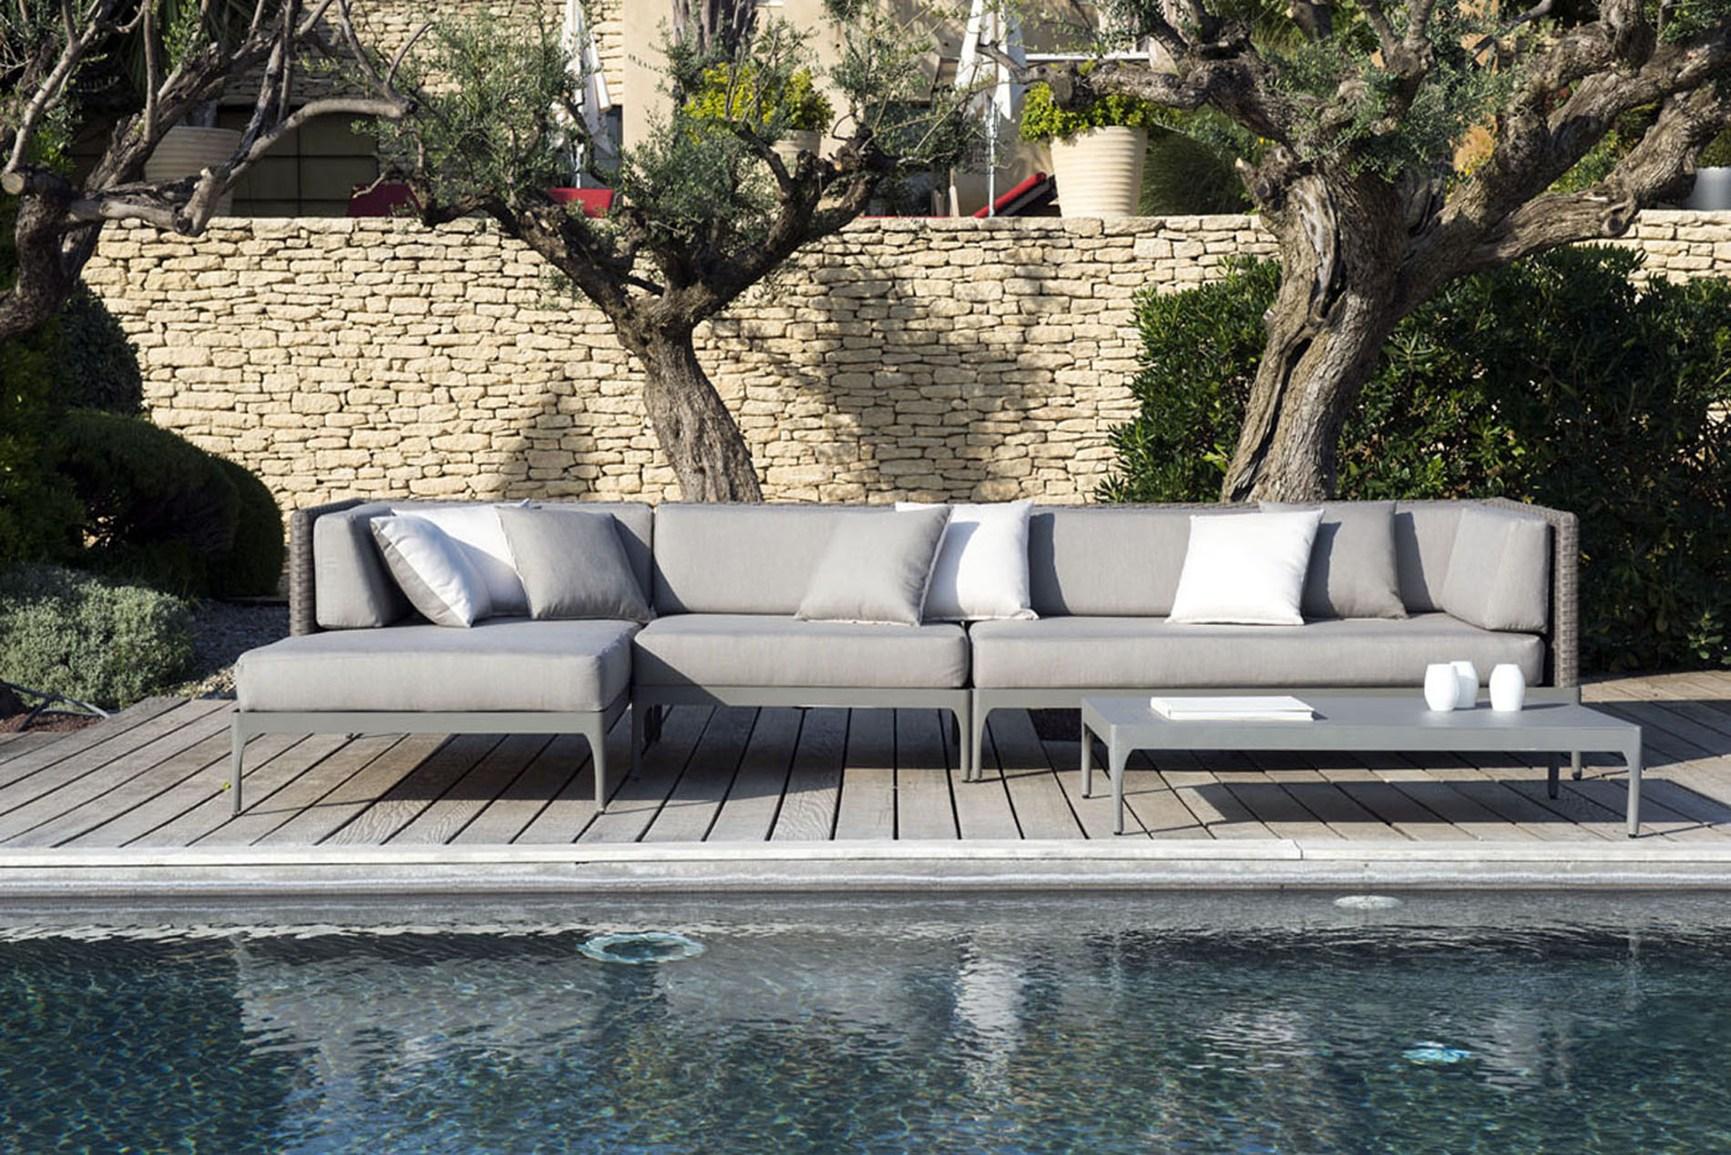 le novit firmate ethimo ai saloni 2013. Black Bedroom Furniture Sets. Home Design Ideas